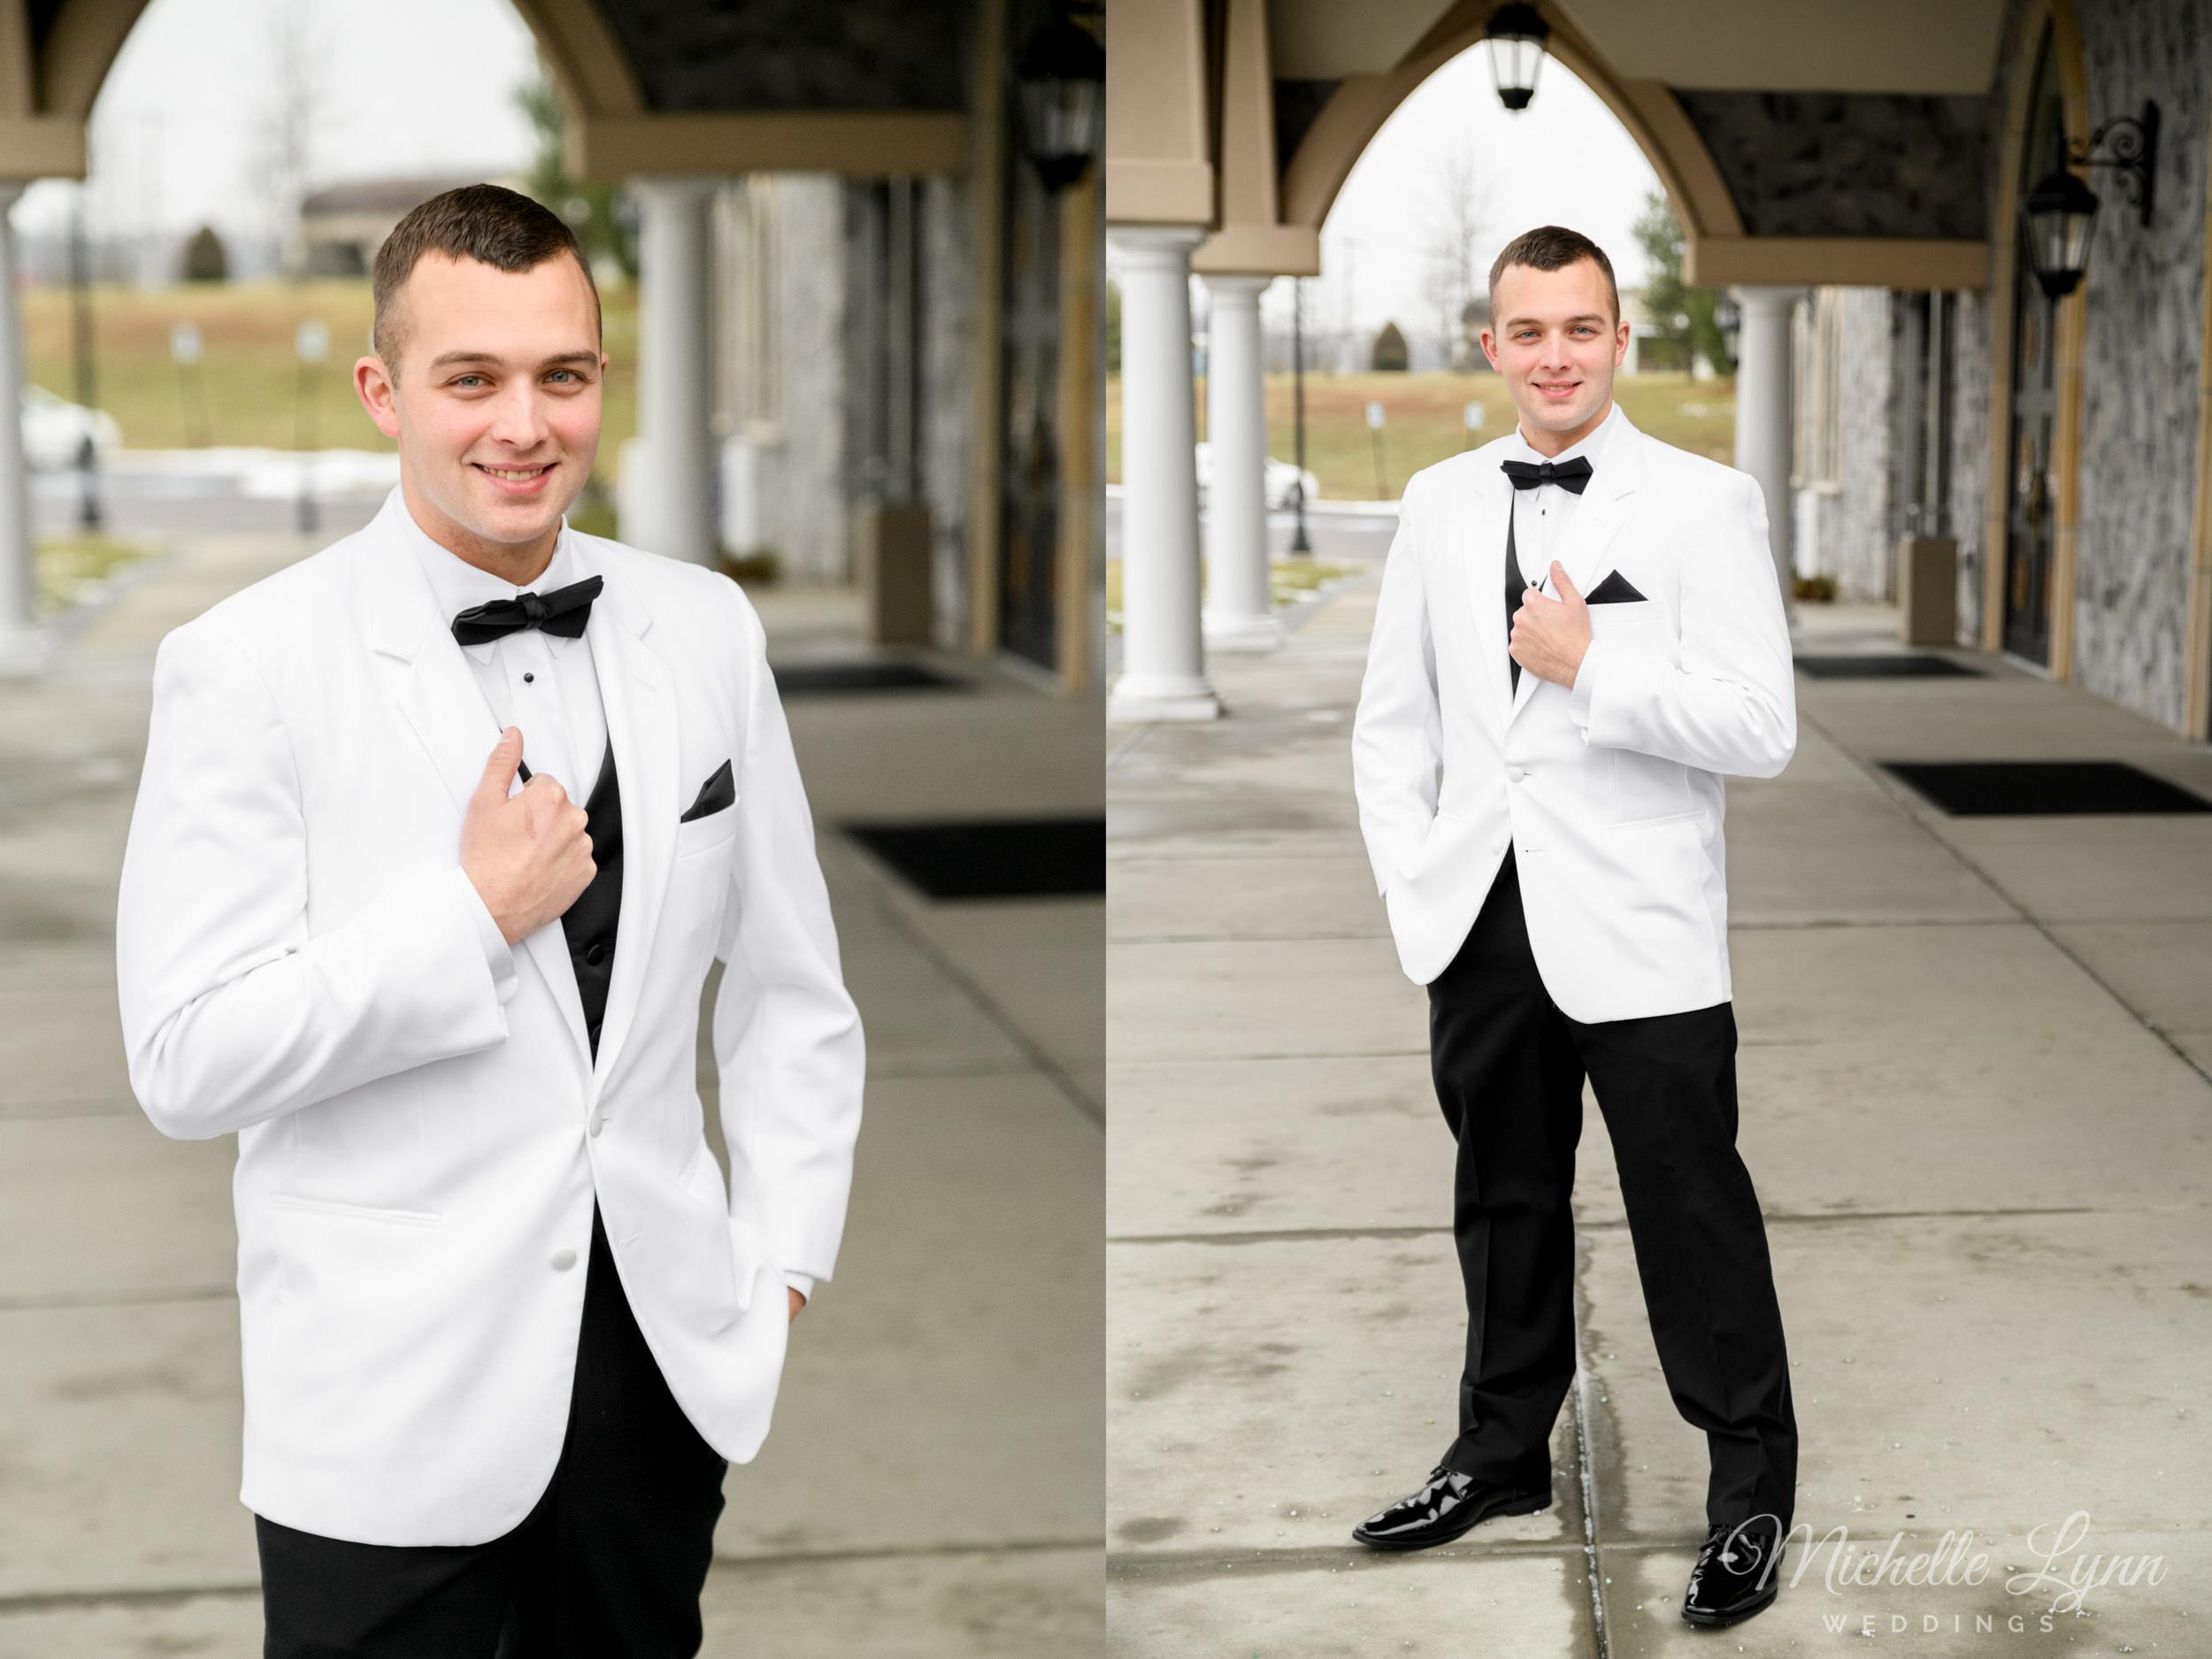 william-penn-inn-wedding-photography-mlw-39.jpg